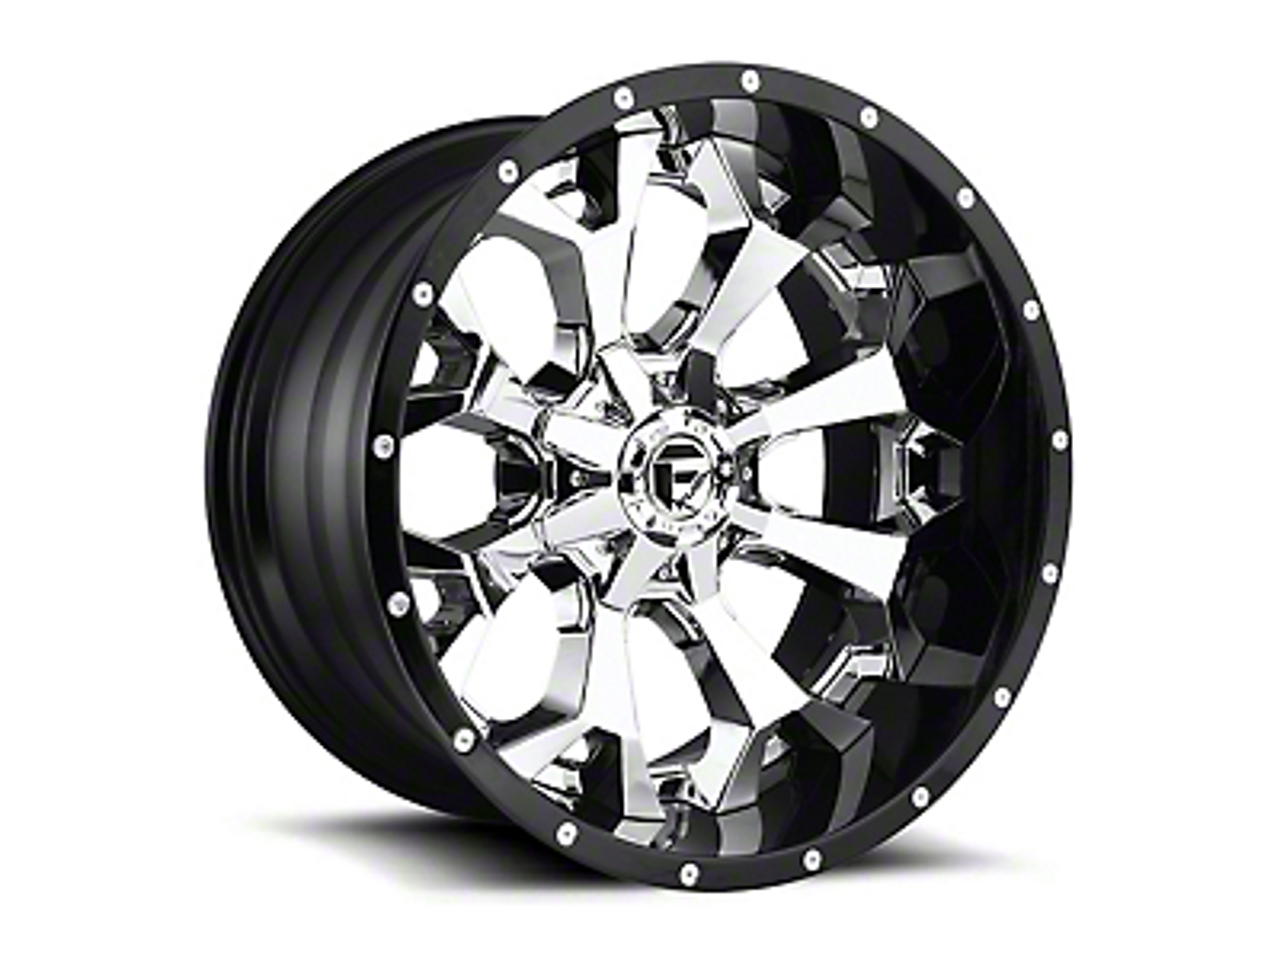 Fuel Wheels Assault Matte Black Milled 6-Lug Wheel - 20x12 (99-18 Silverado 1500)